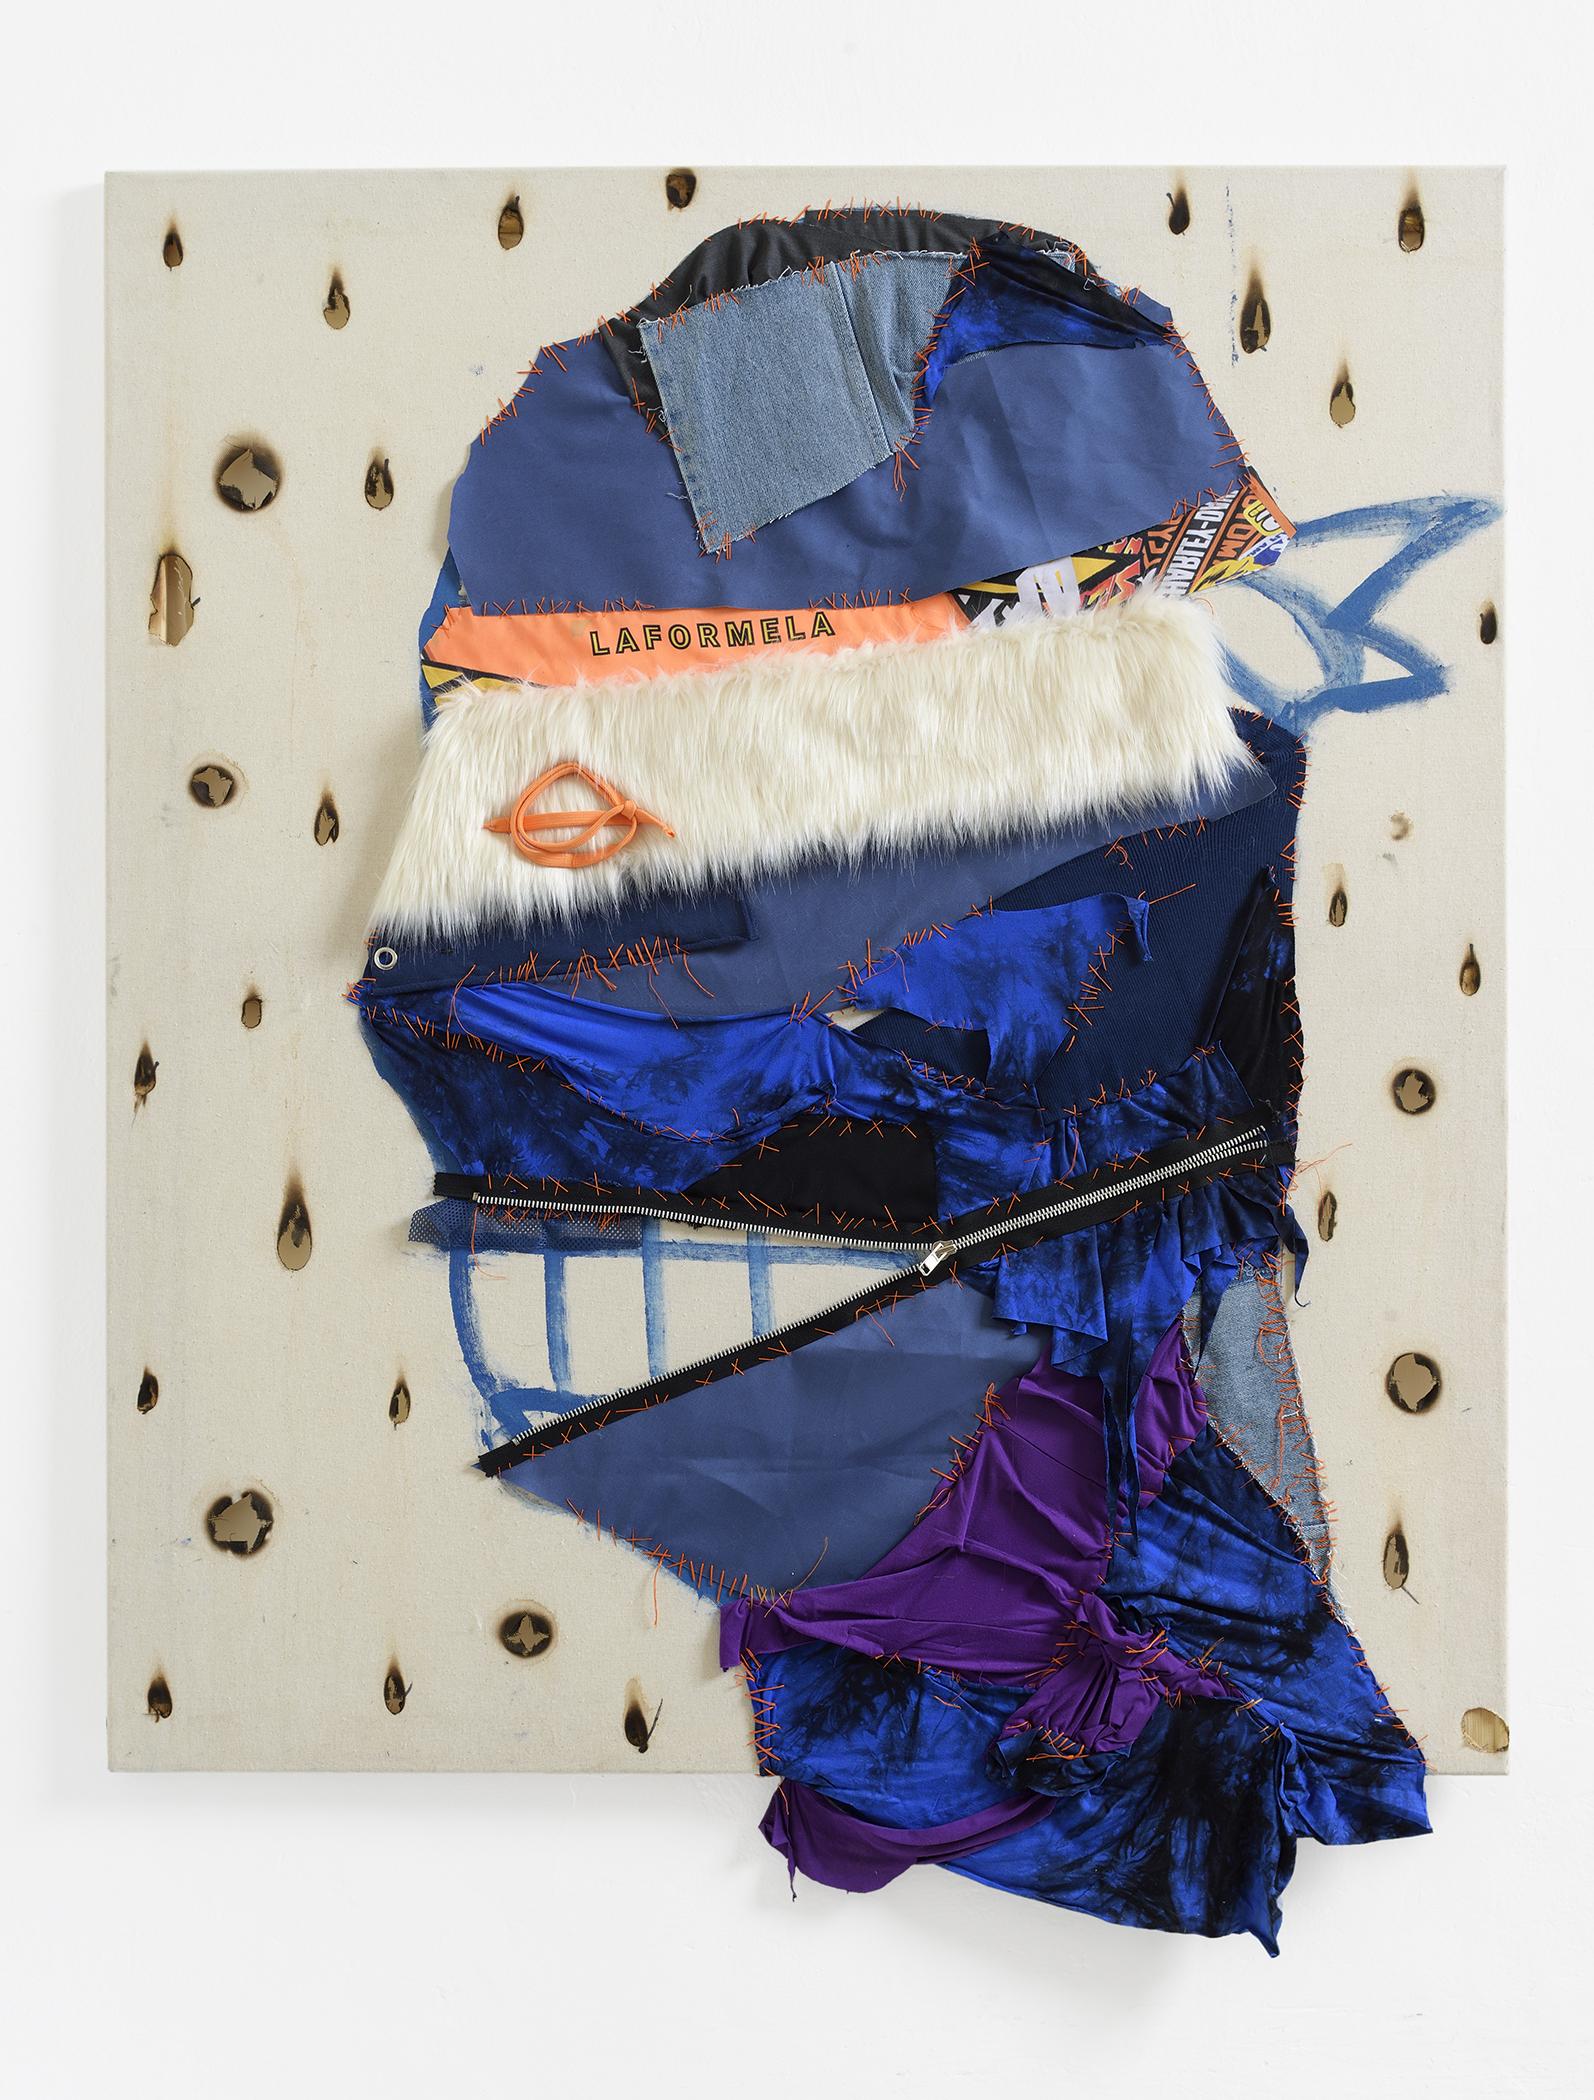 Martin Lukáč x Laformela  Laformela , 2018, Various materials on cotton, acrylic and burn marks, 120 x 104 cm